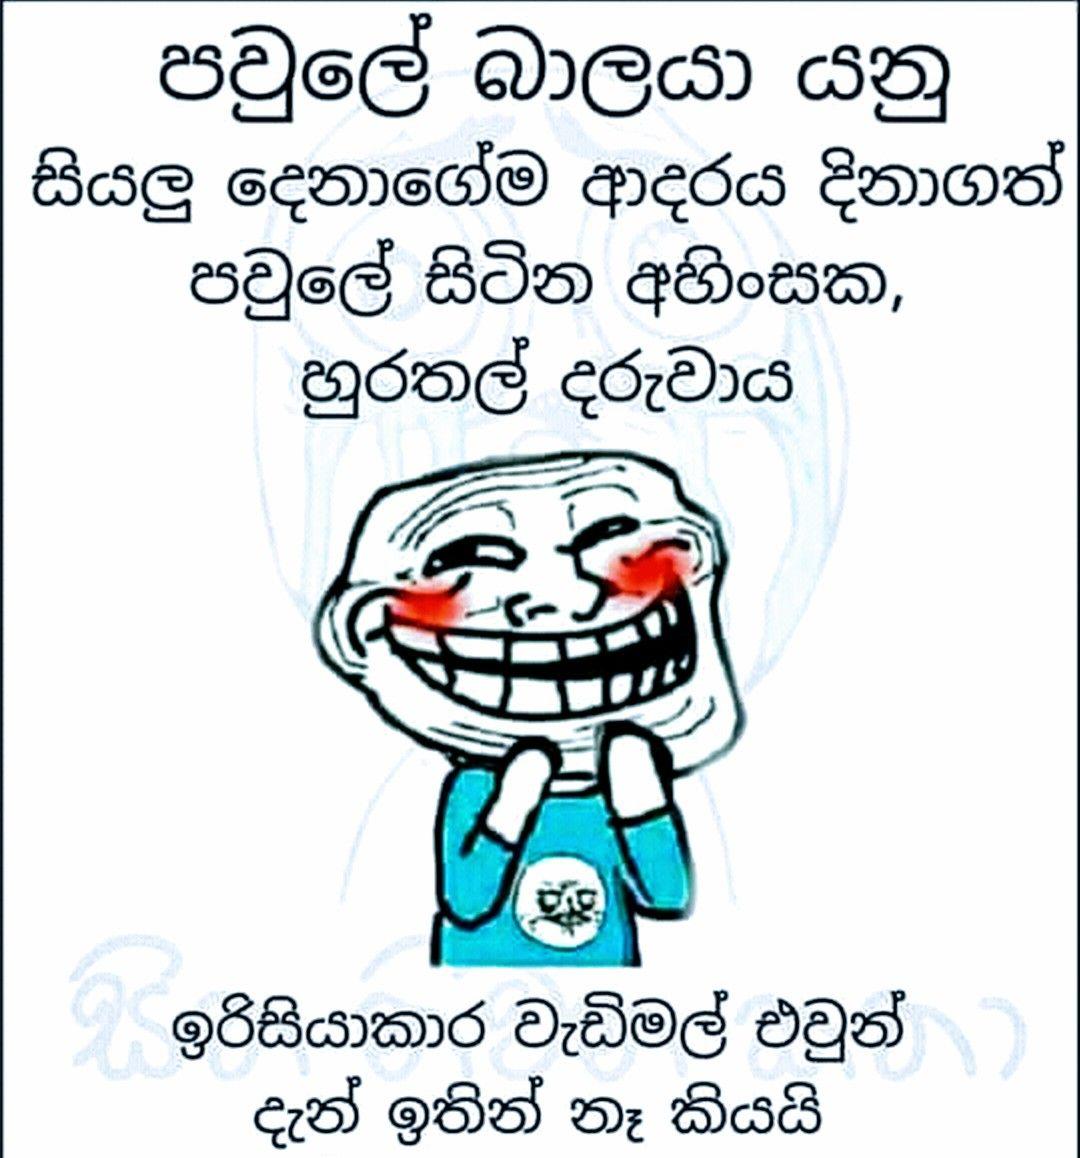 Pin By Thimali Perera On Lankan Memes Jokes Quotes Friends Quotes Baby Jokes